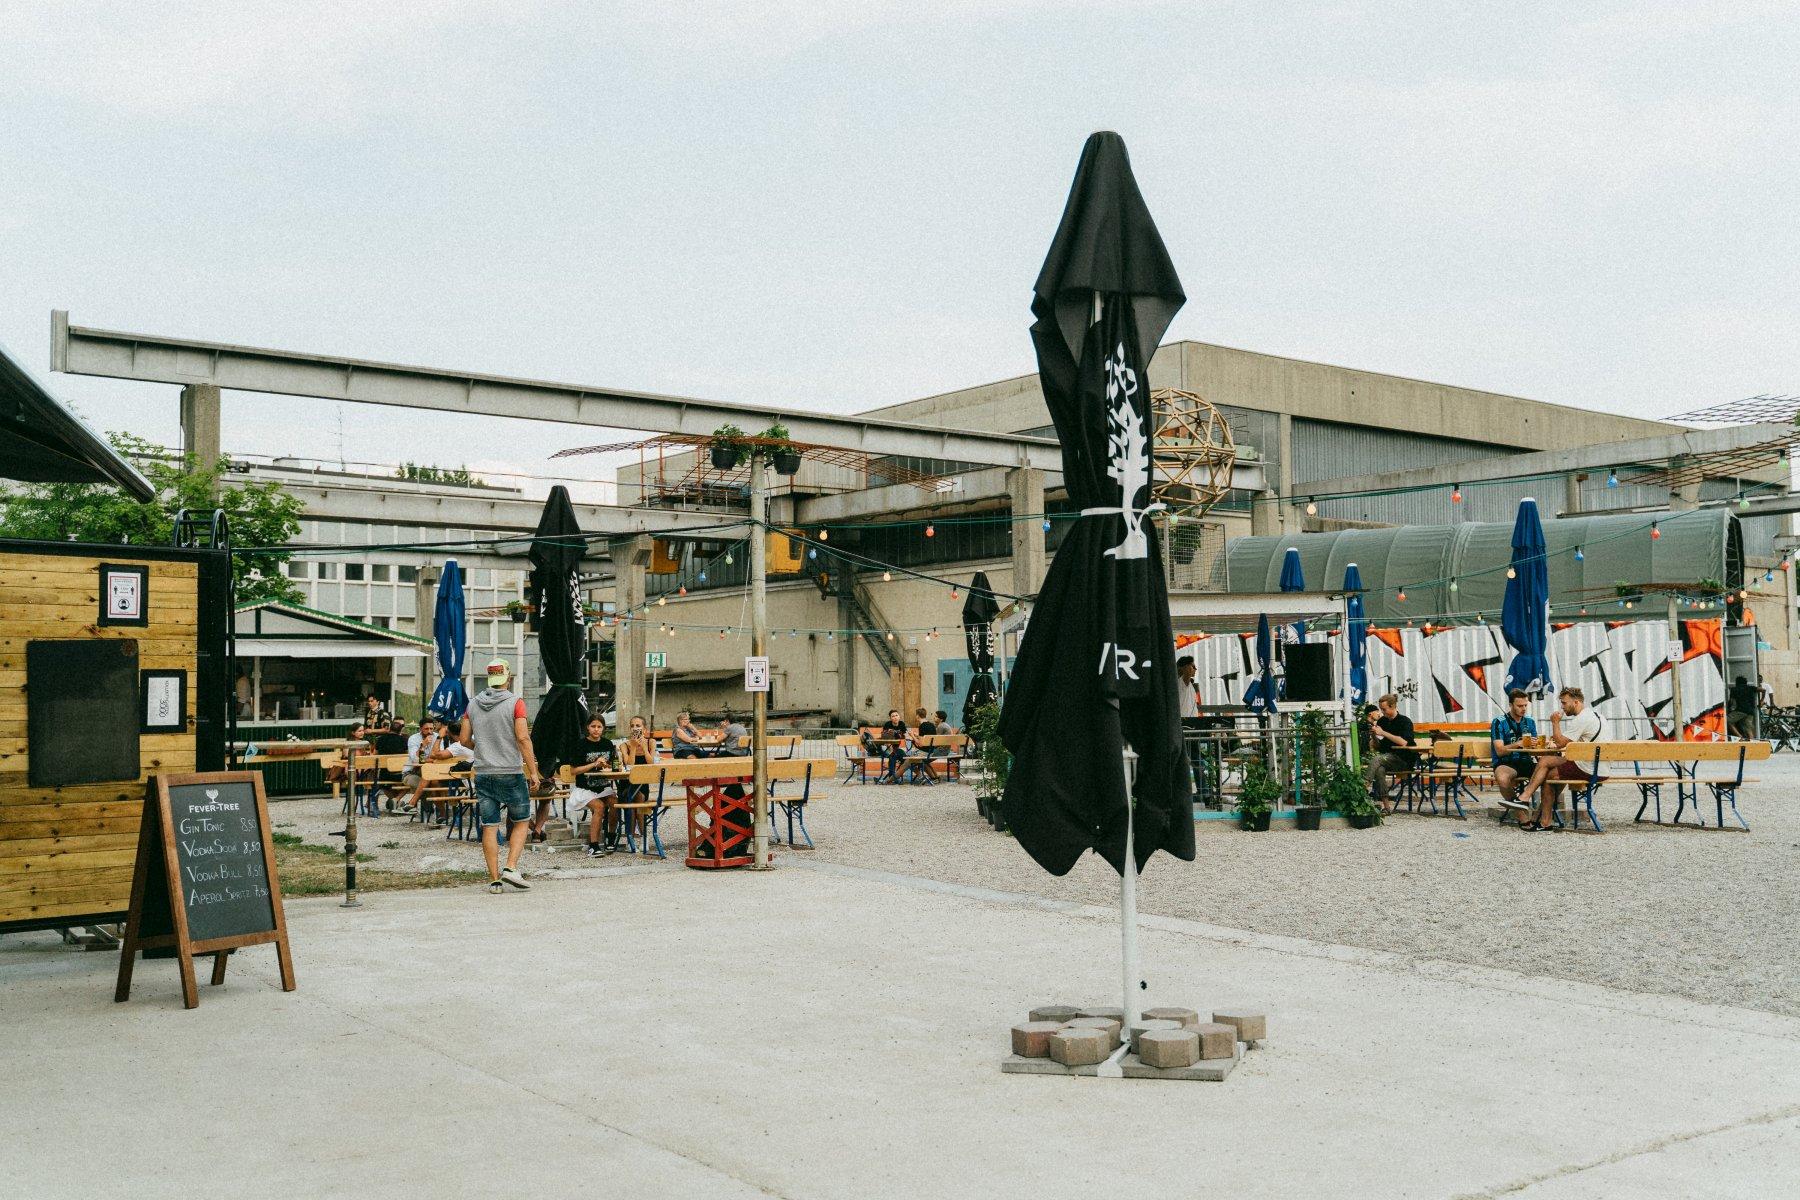 Geheimtipp München Sugarmountain 42 – ©wunderland media GmbH